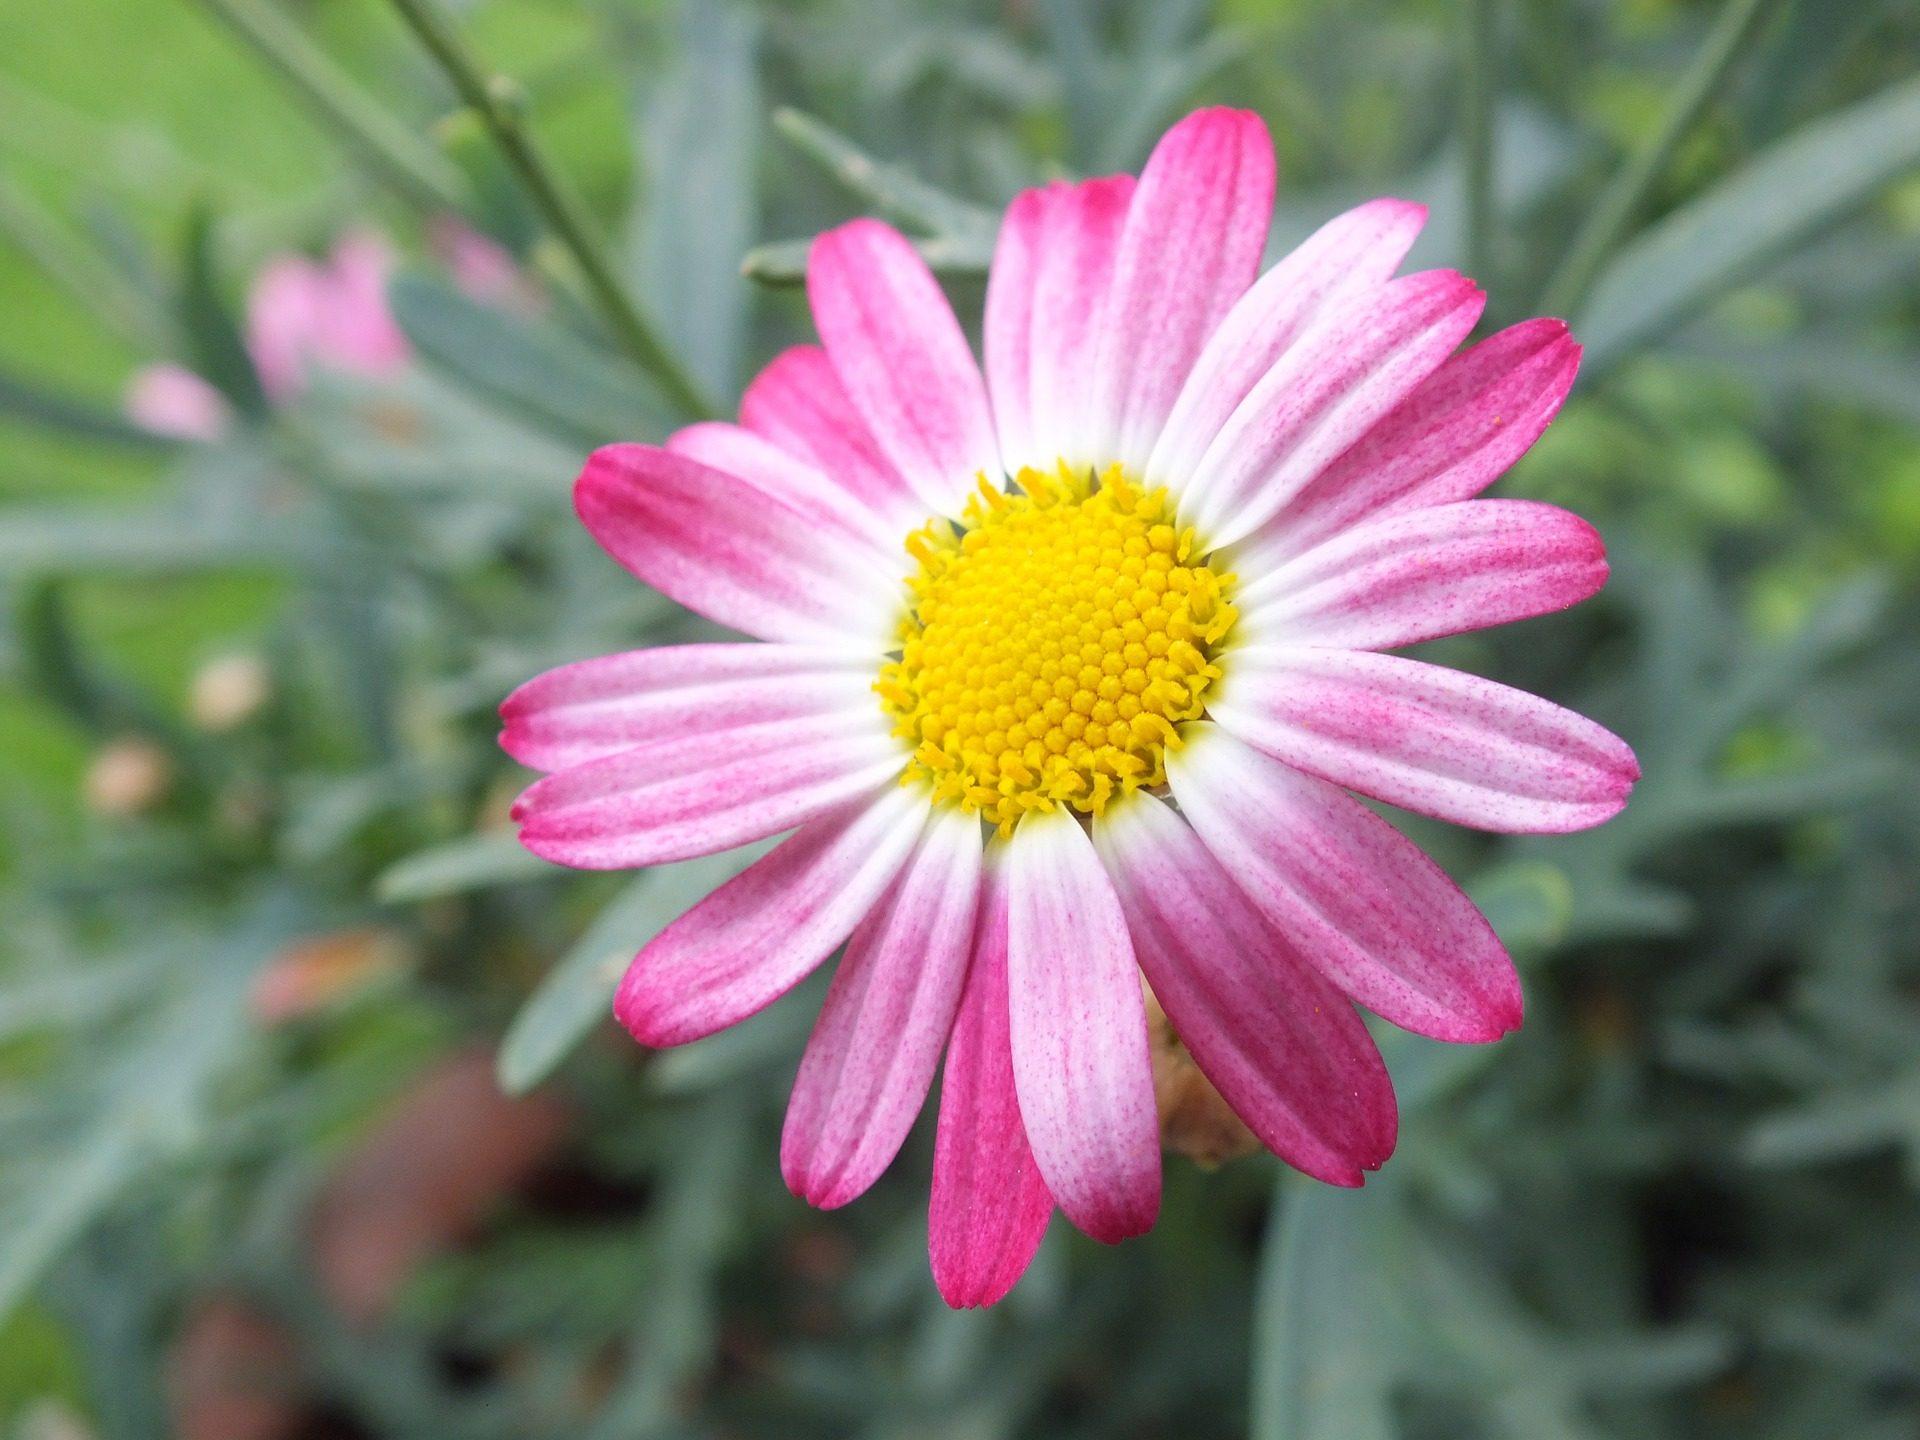 Маргарита, цветок, лепестки, Сад, Floración, Роза - Обои HD - Профессор falken.com